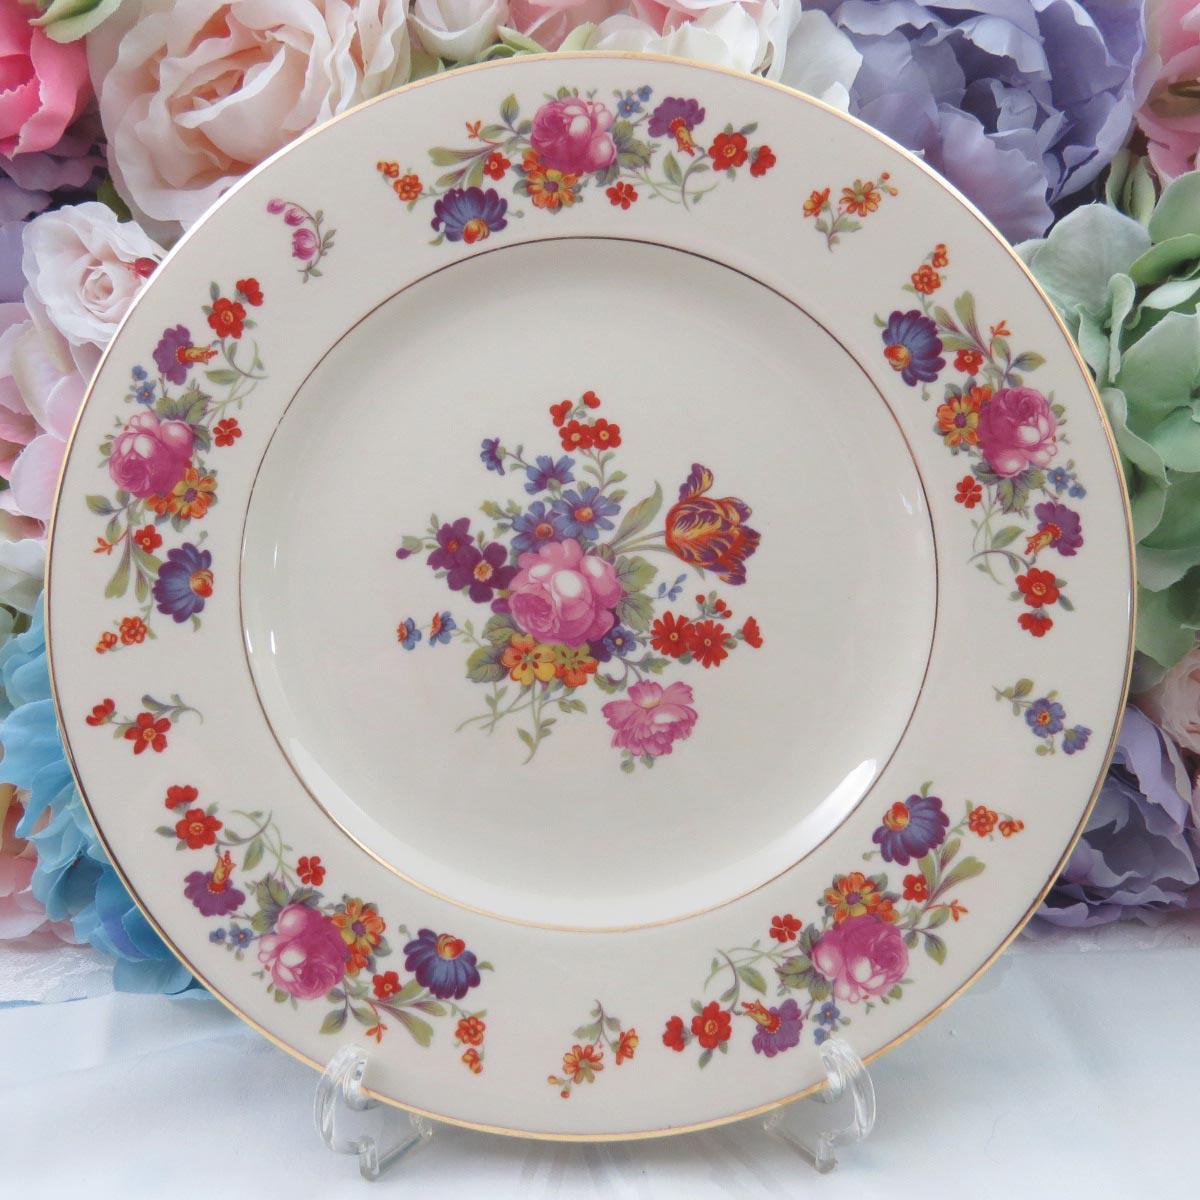 Vintage Mismatched Fine China Dinner Plates - Set of 4 - Image 4 of 9 & Vintage Mismatched Fine China Dinner Plates - Set of 4 | Chairish